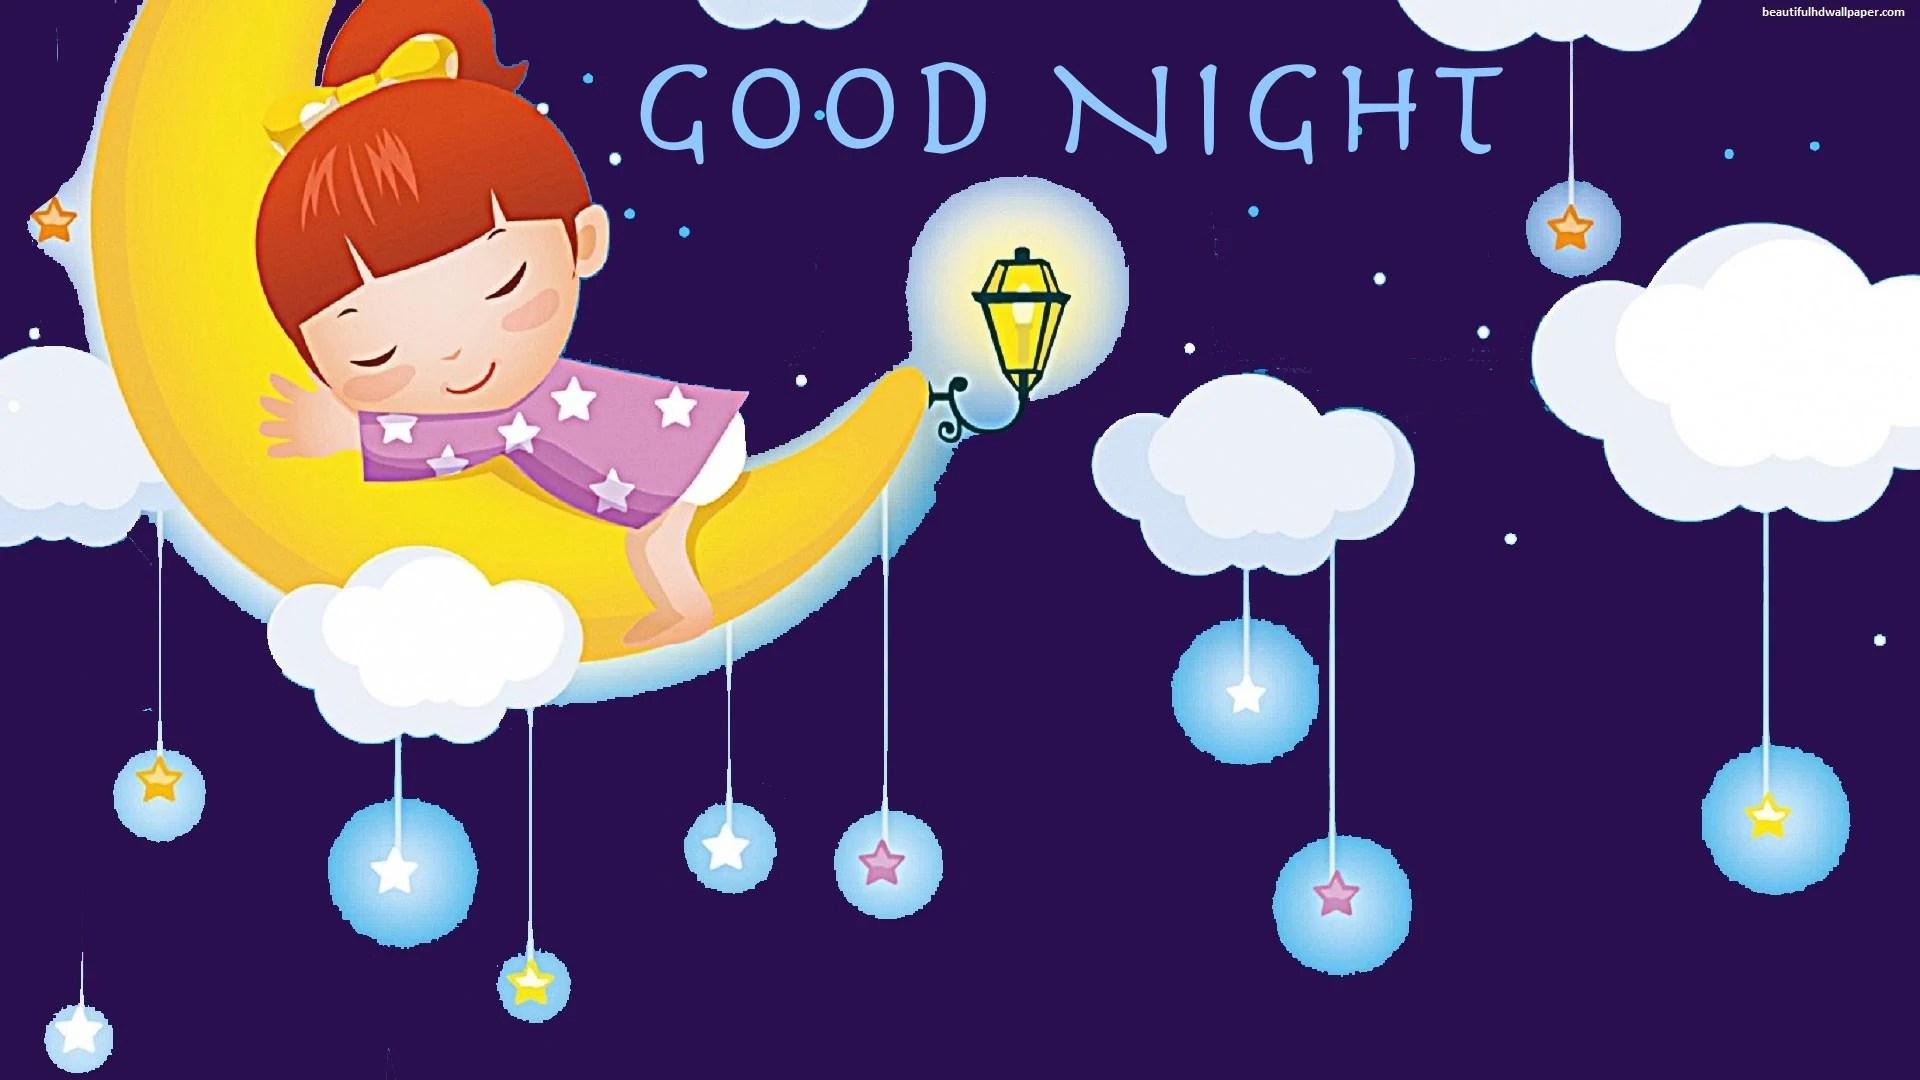 good night cute girl holding moon image